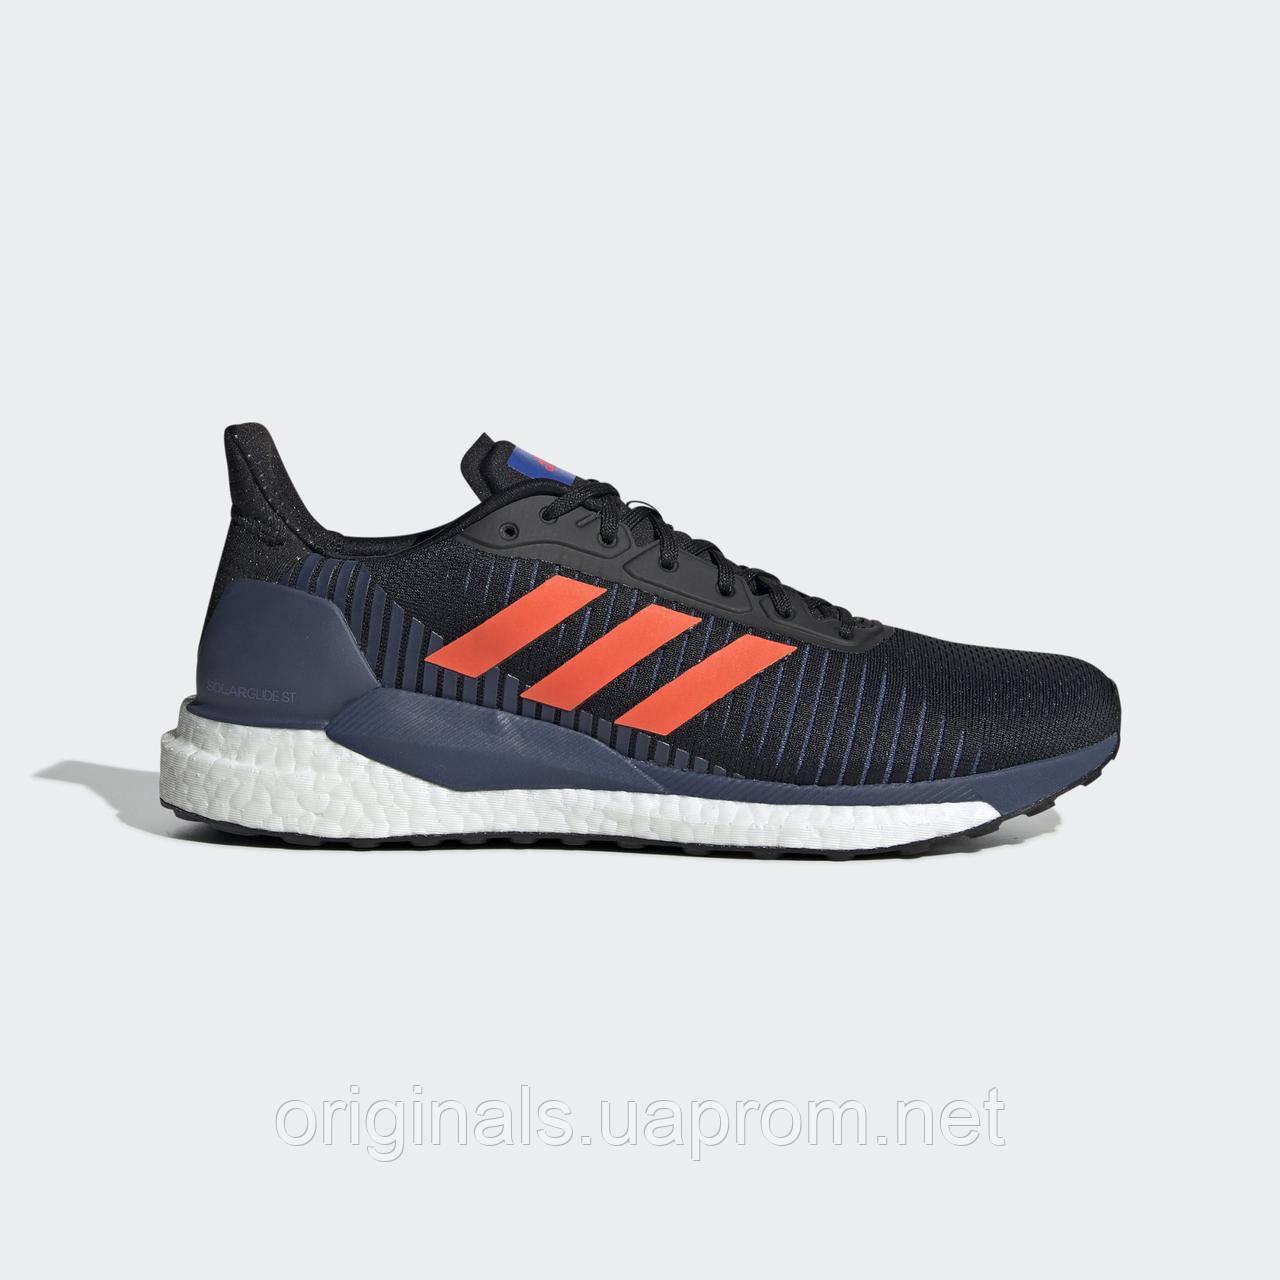 Кросівки для бігу Adidas Solar Glide ST 19 EE4290